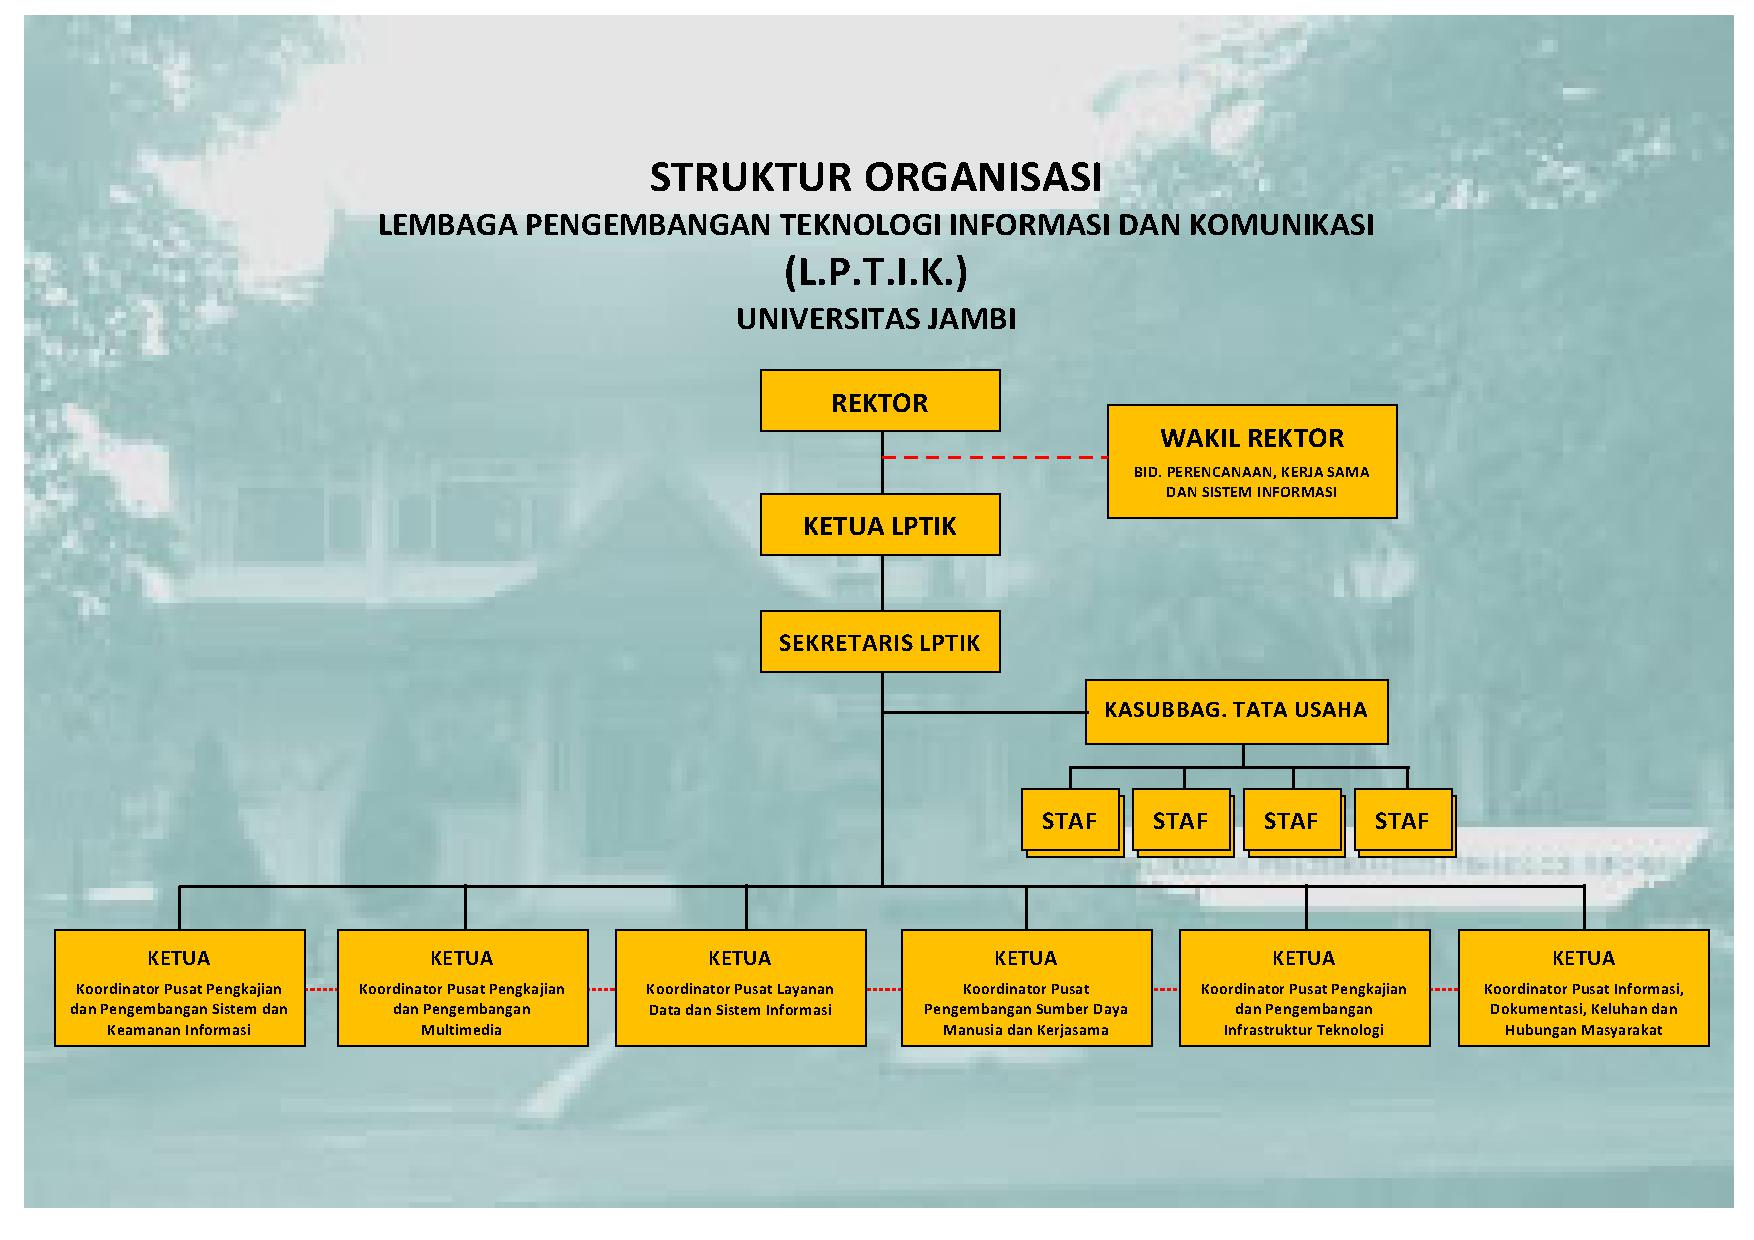 STRUKTUR ORGANISASI LPTIK_1